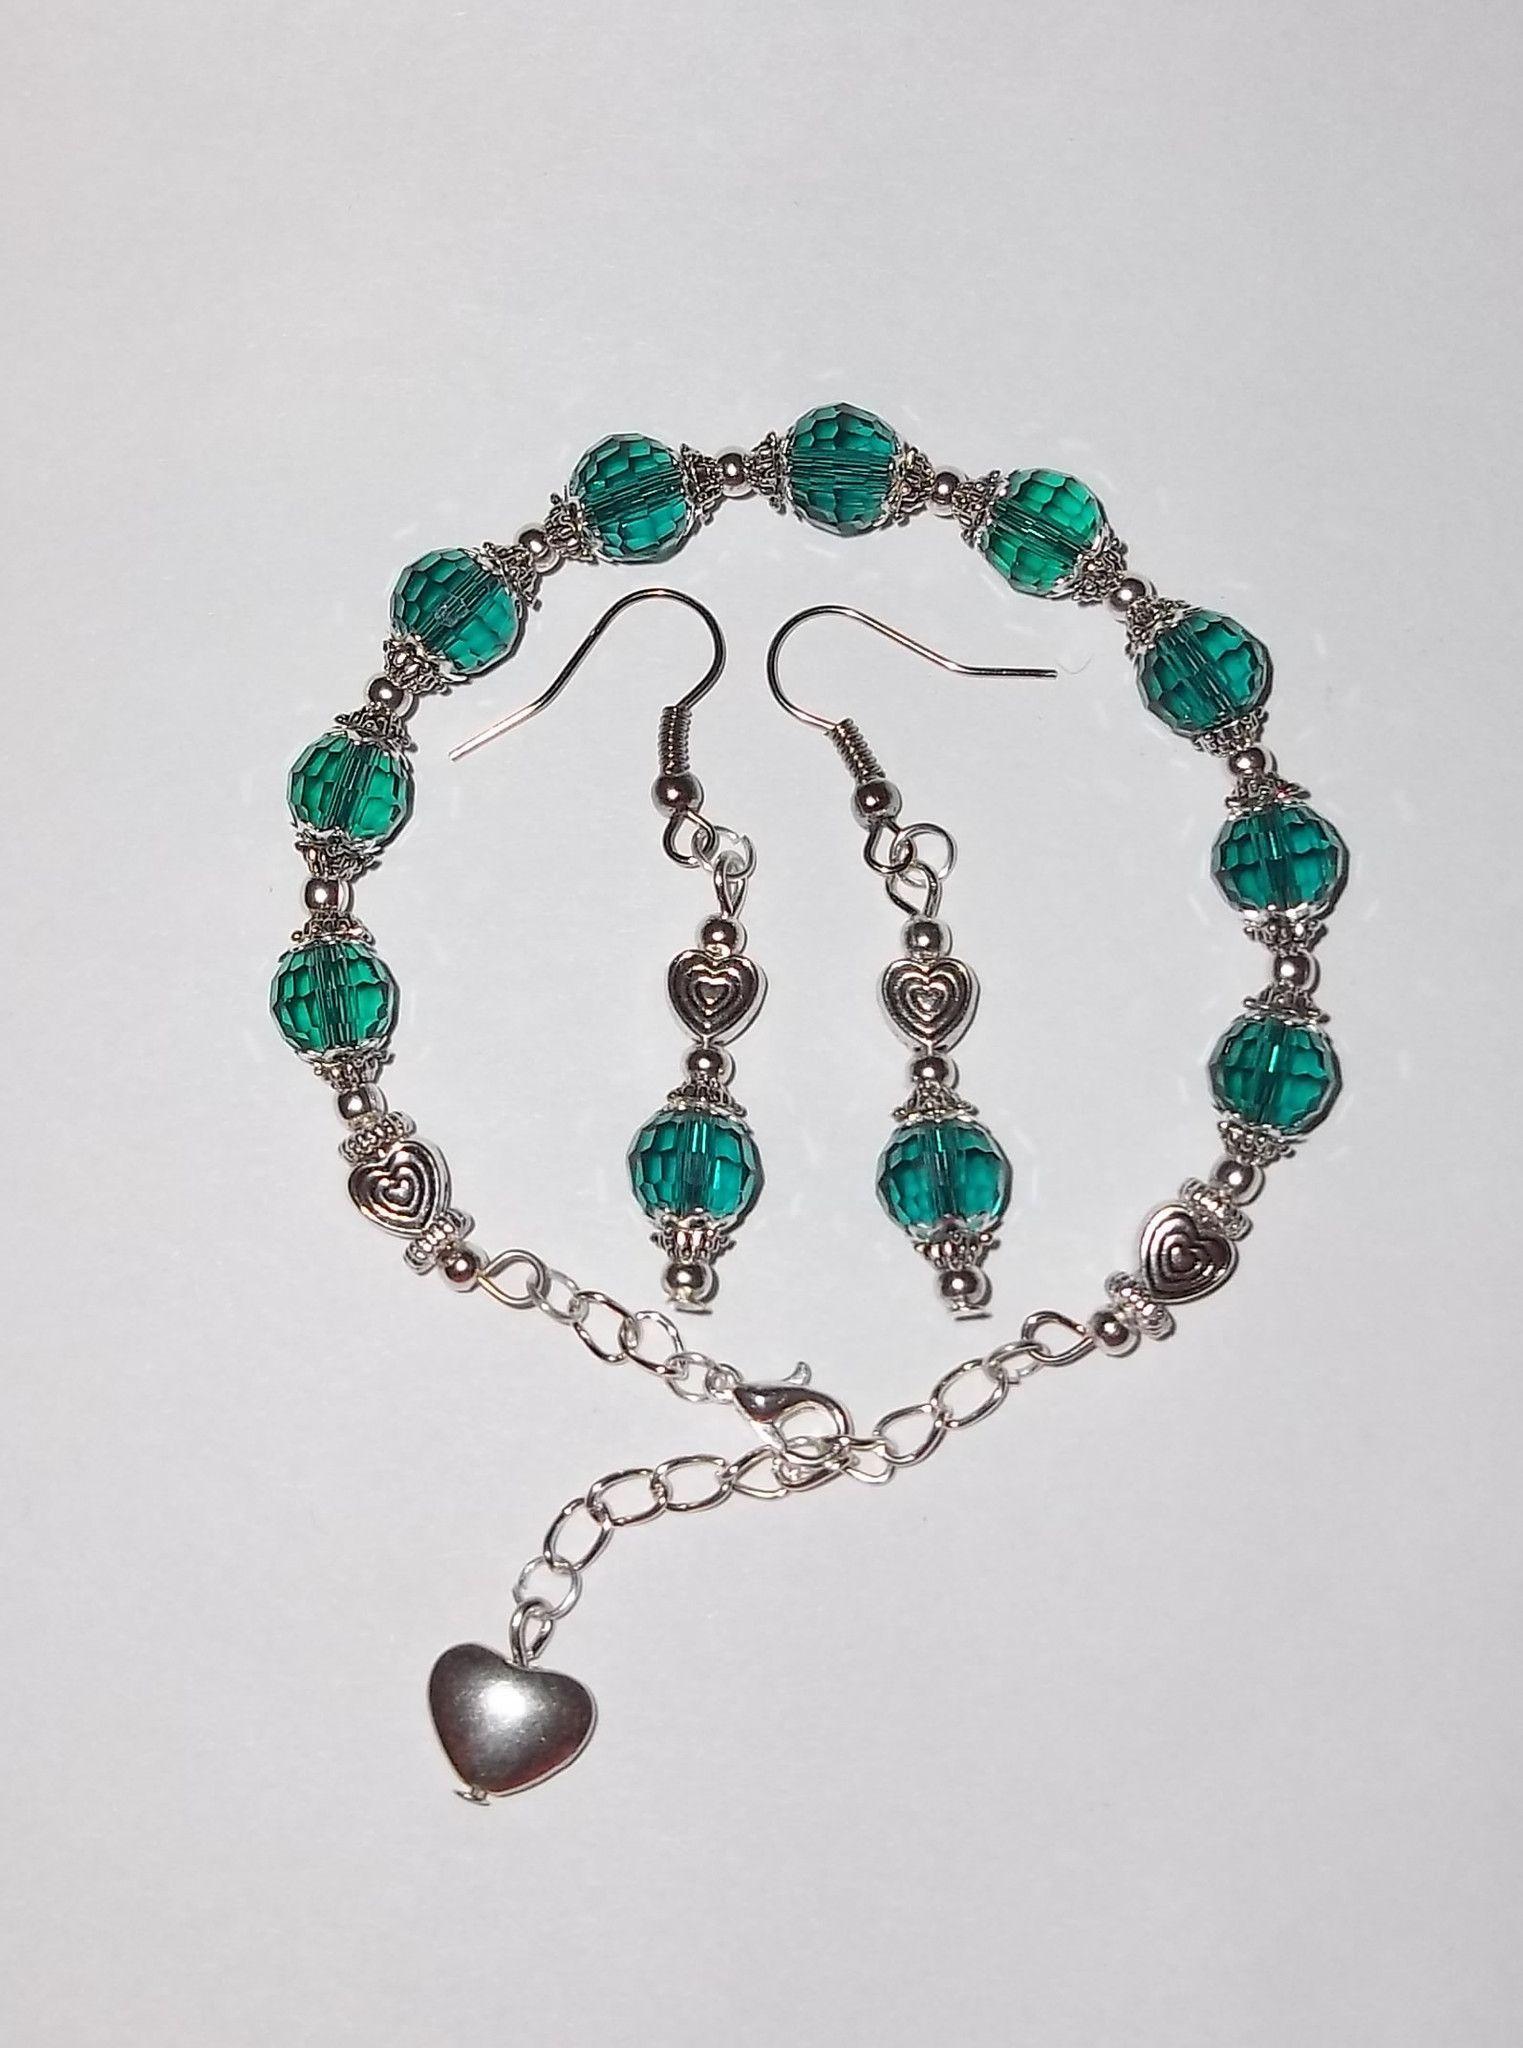 62a131eebd55c2 Peacock Blue Swarovski Crystal   Tibetan Silver Half Bangle   Earring Set